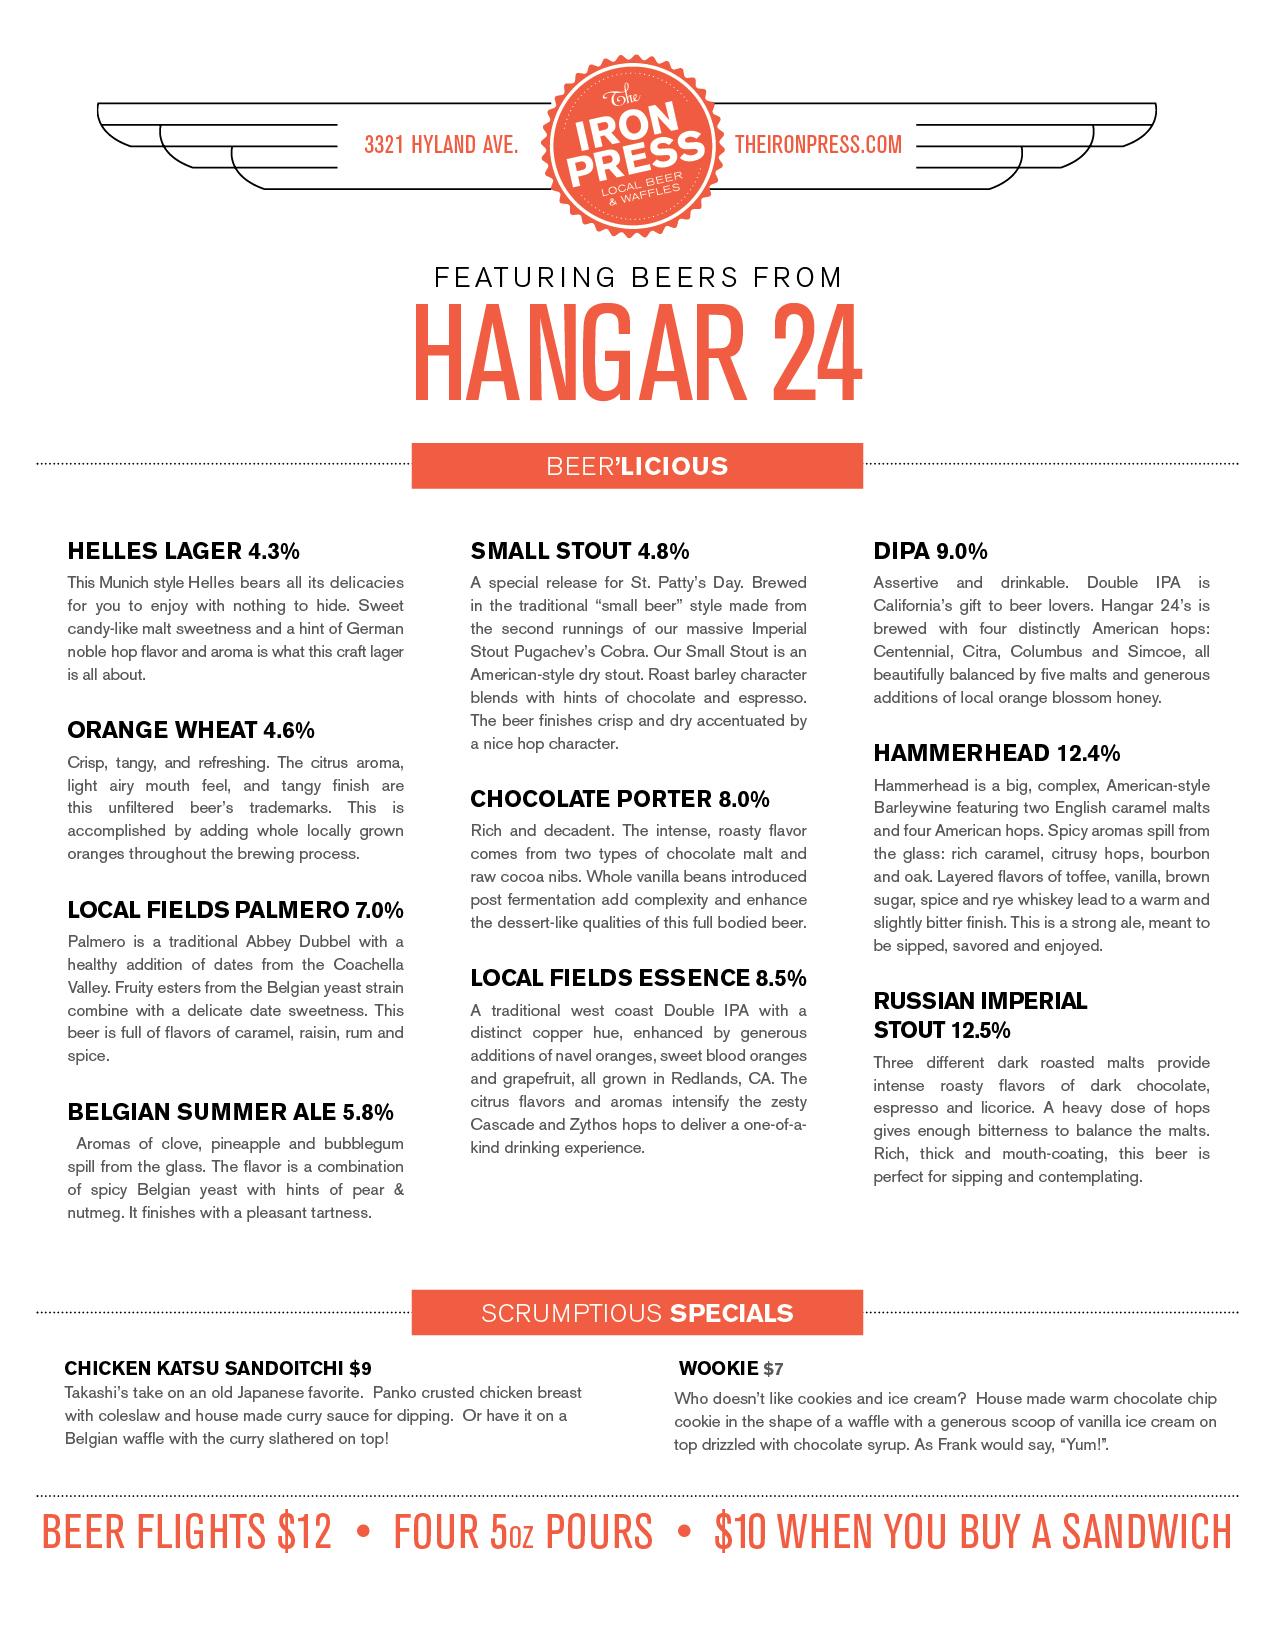 Hangar 24 x The Iron Press